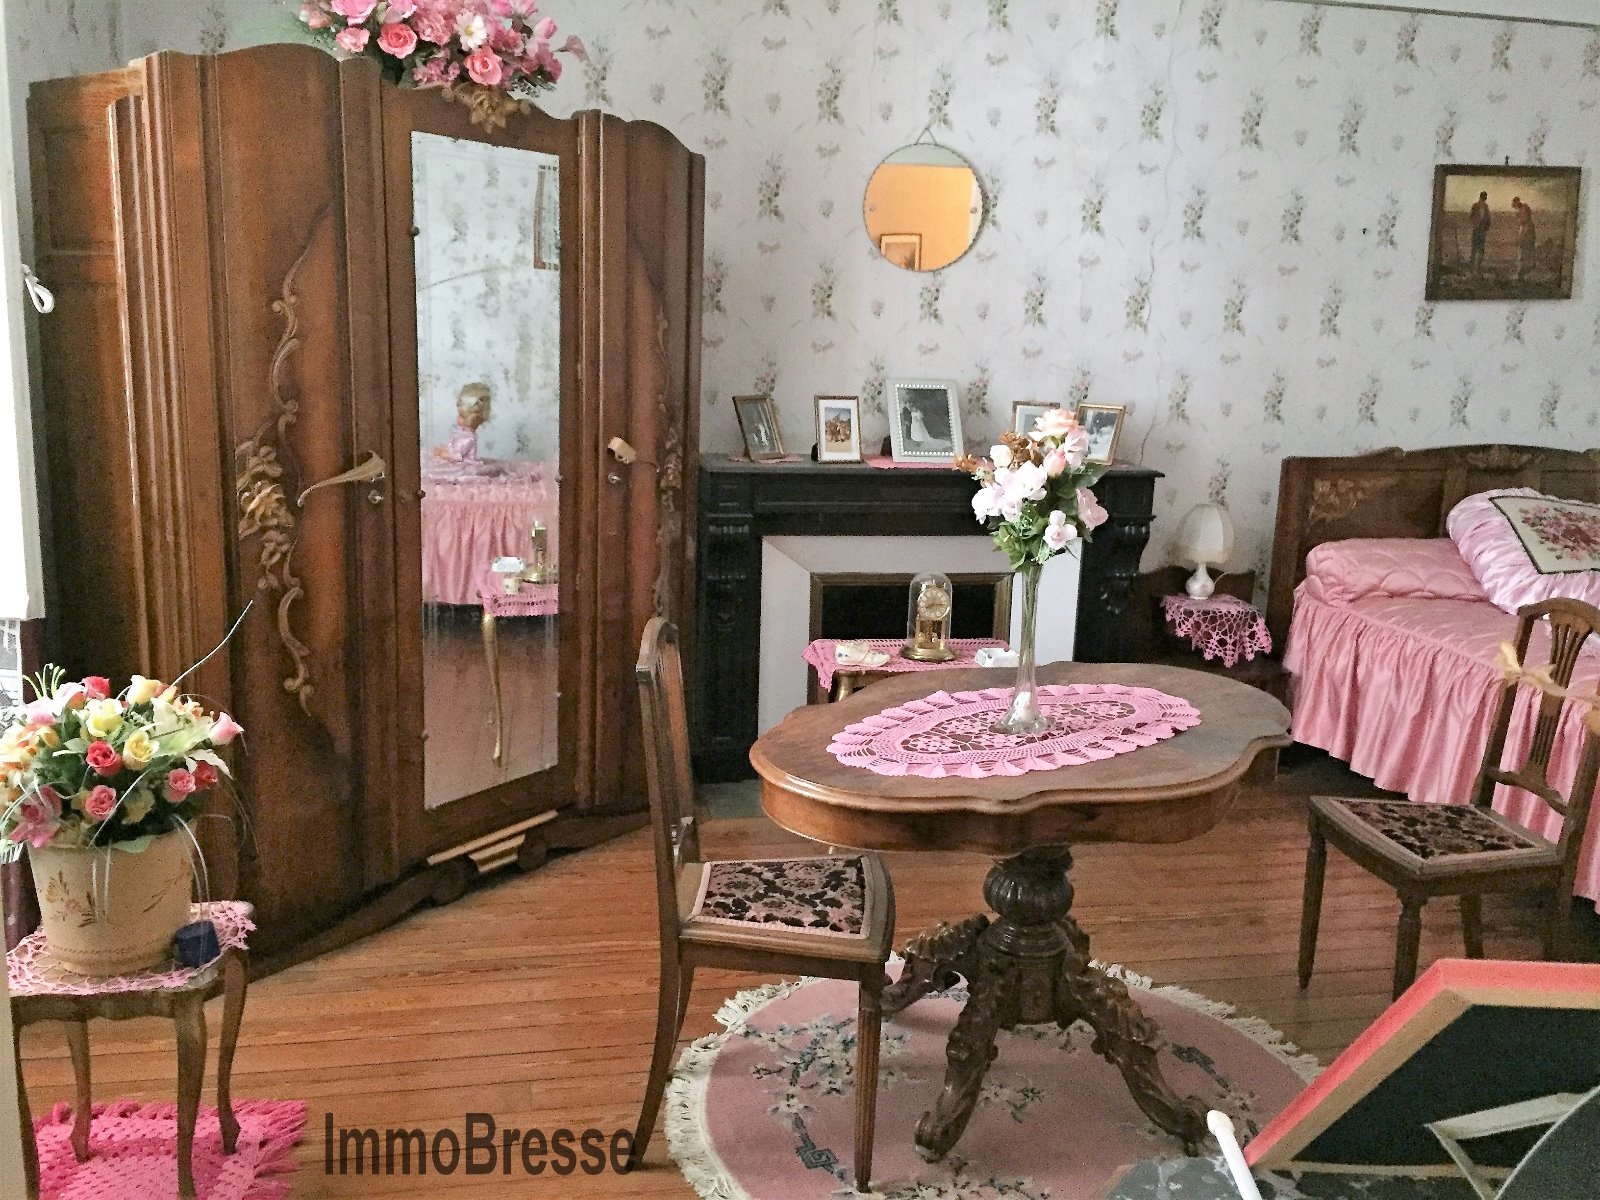 Centre de Varennes A vendre grande maison 6 chambres ImmoBresse